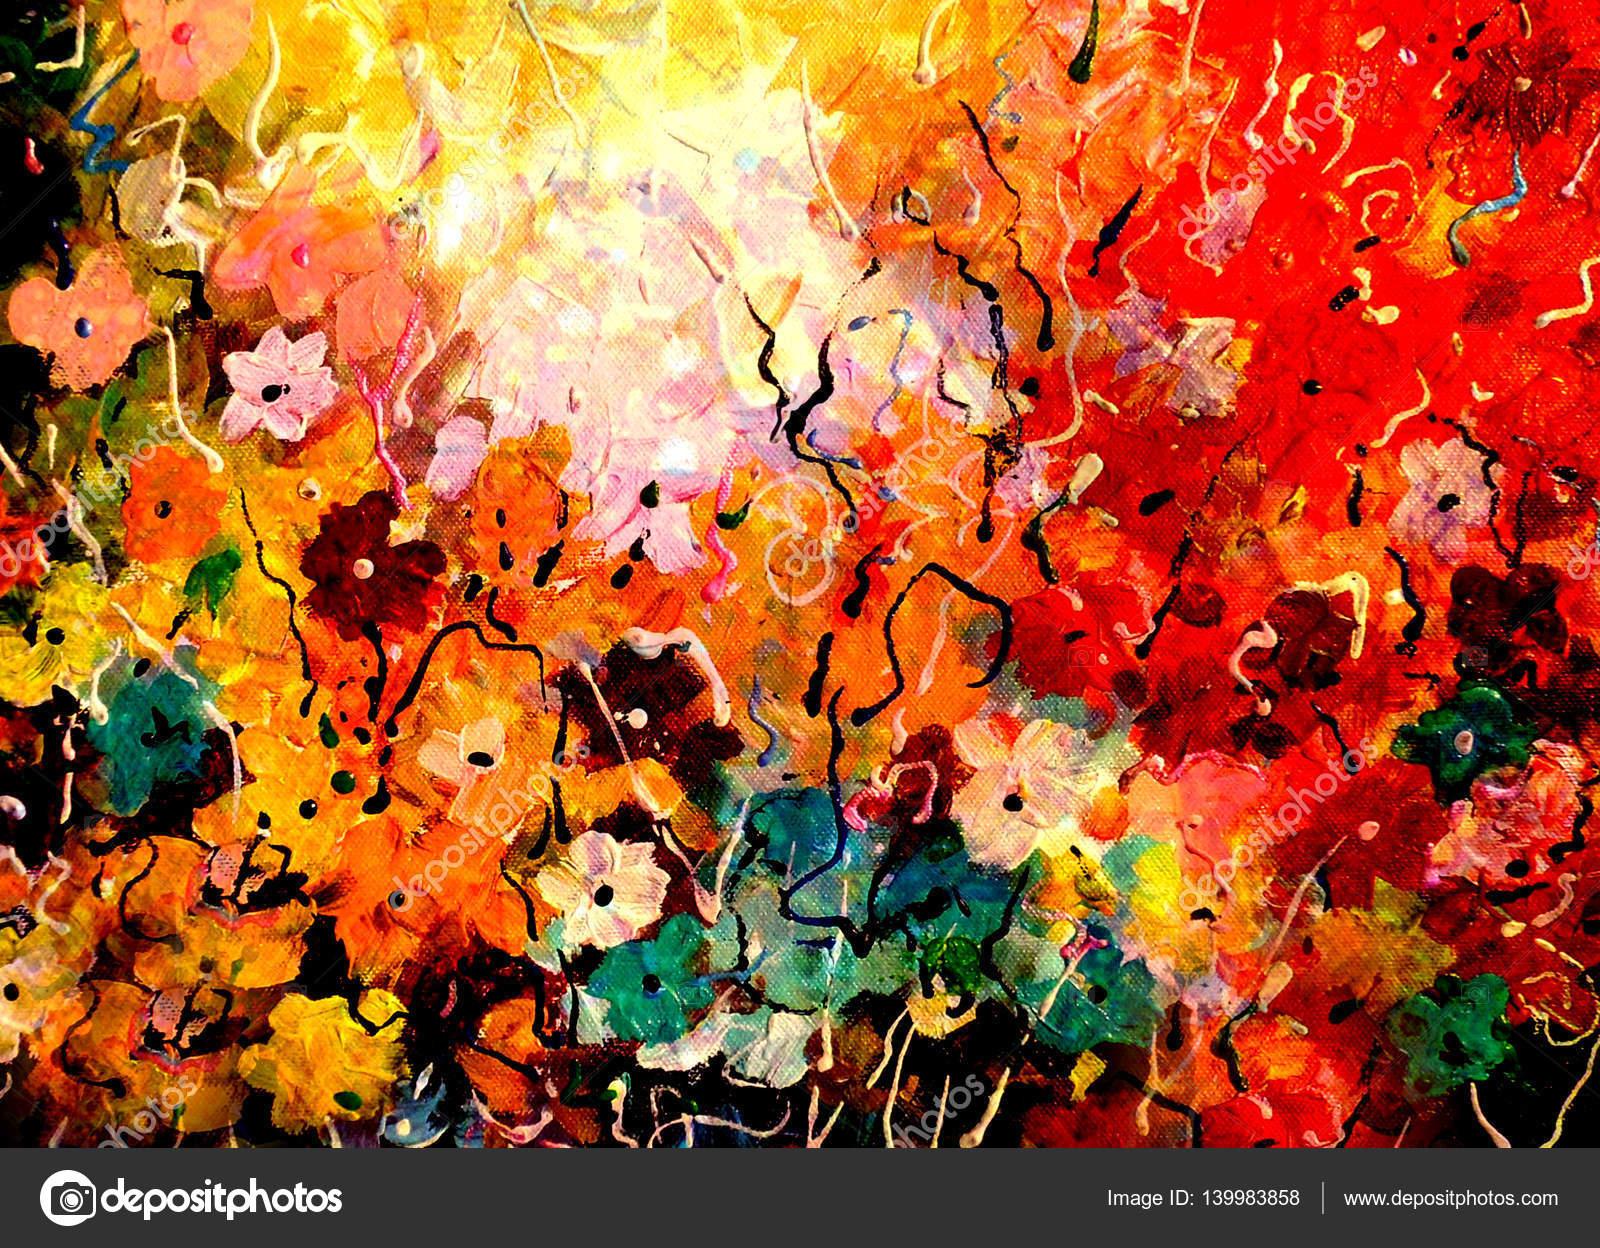 Favoriete Abstract Splash bloemen schilderij — Stockfoto © samillustration @LJ59